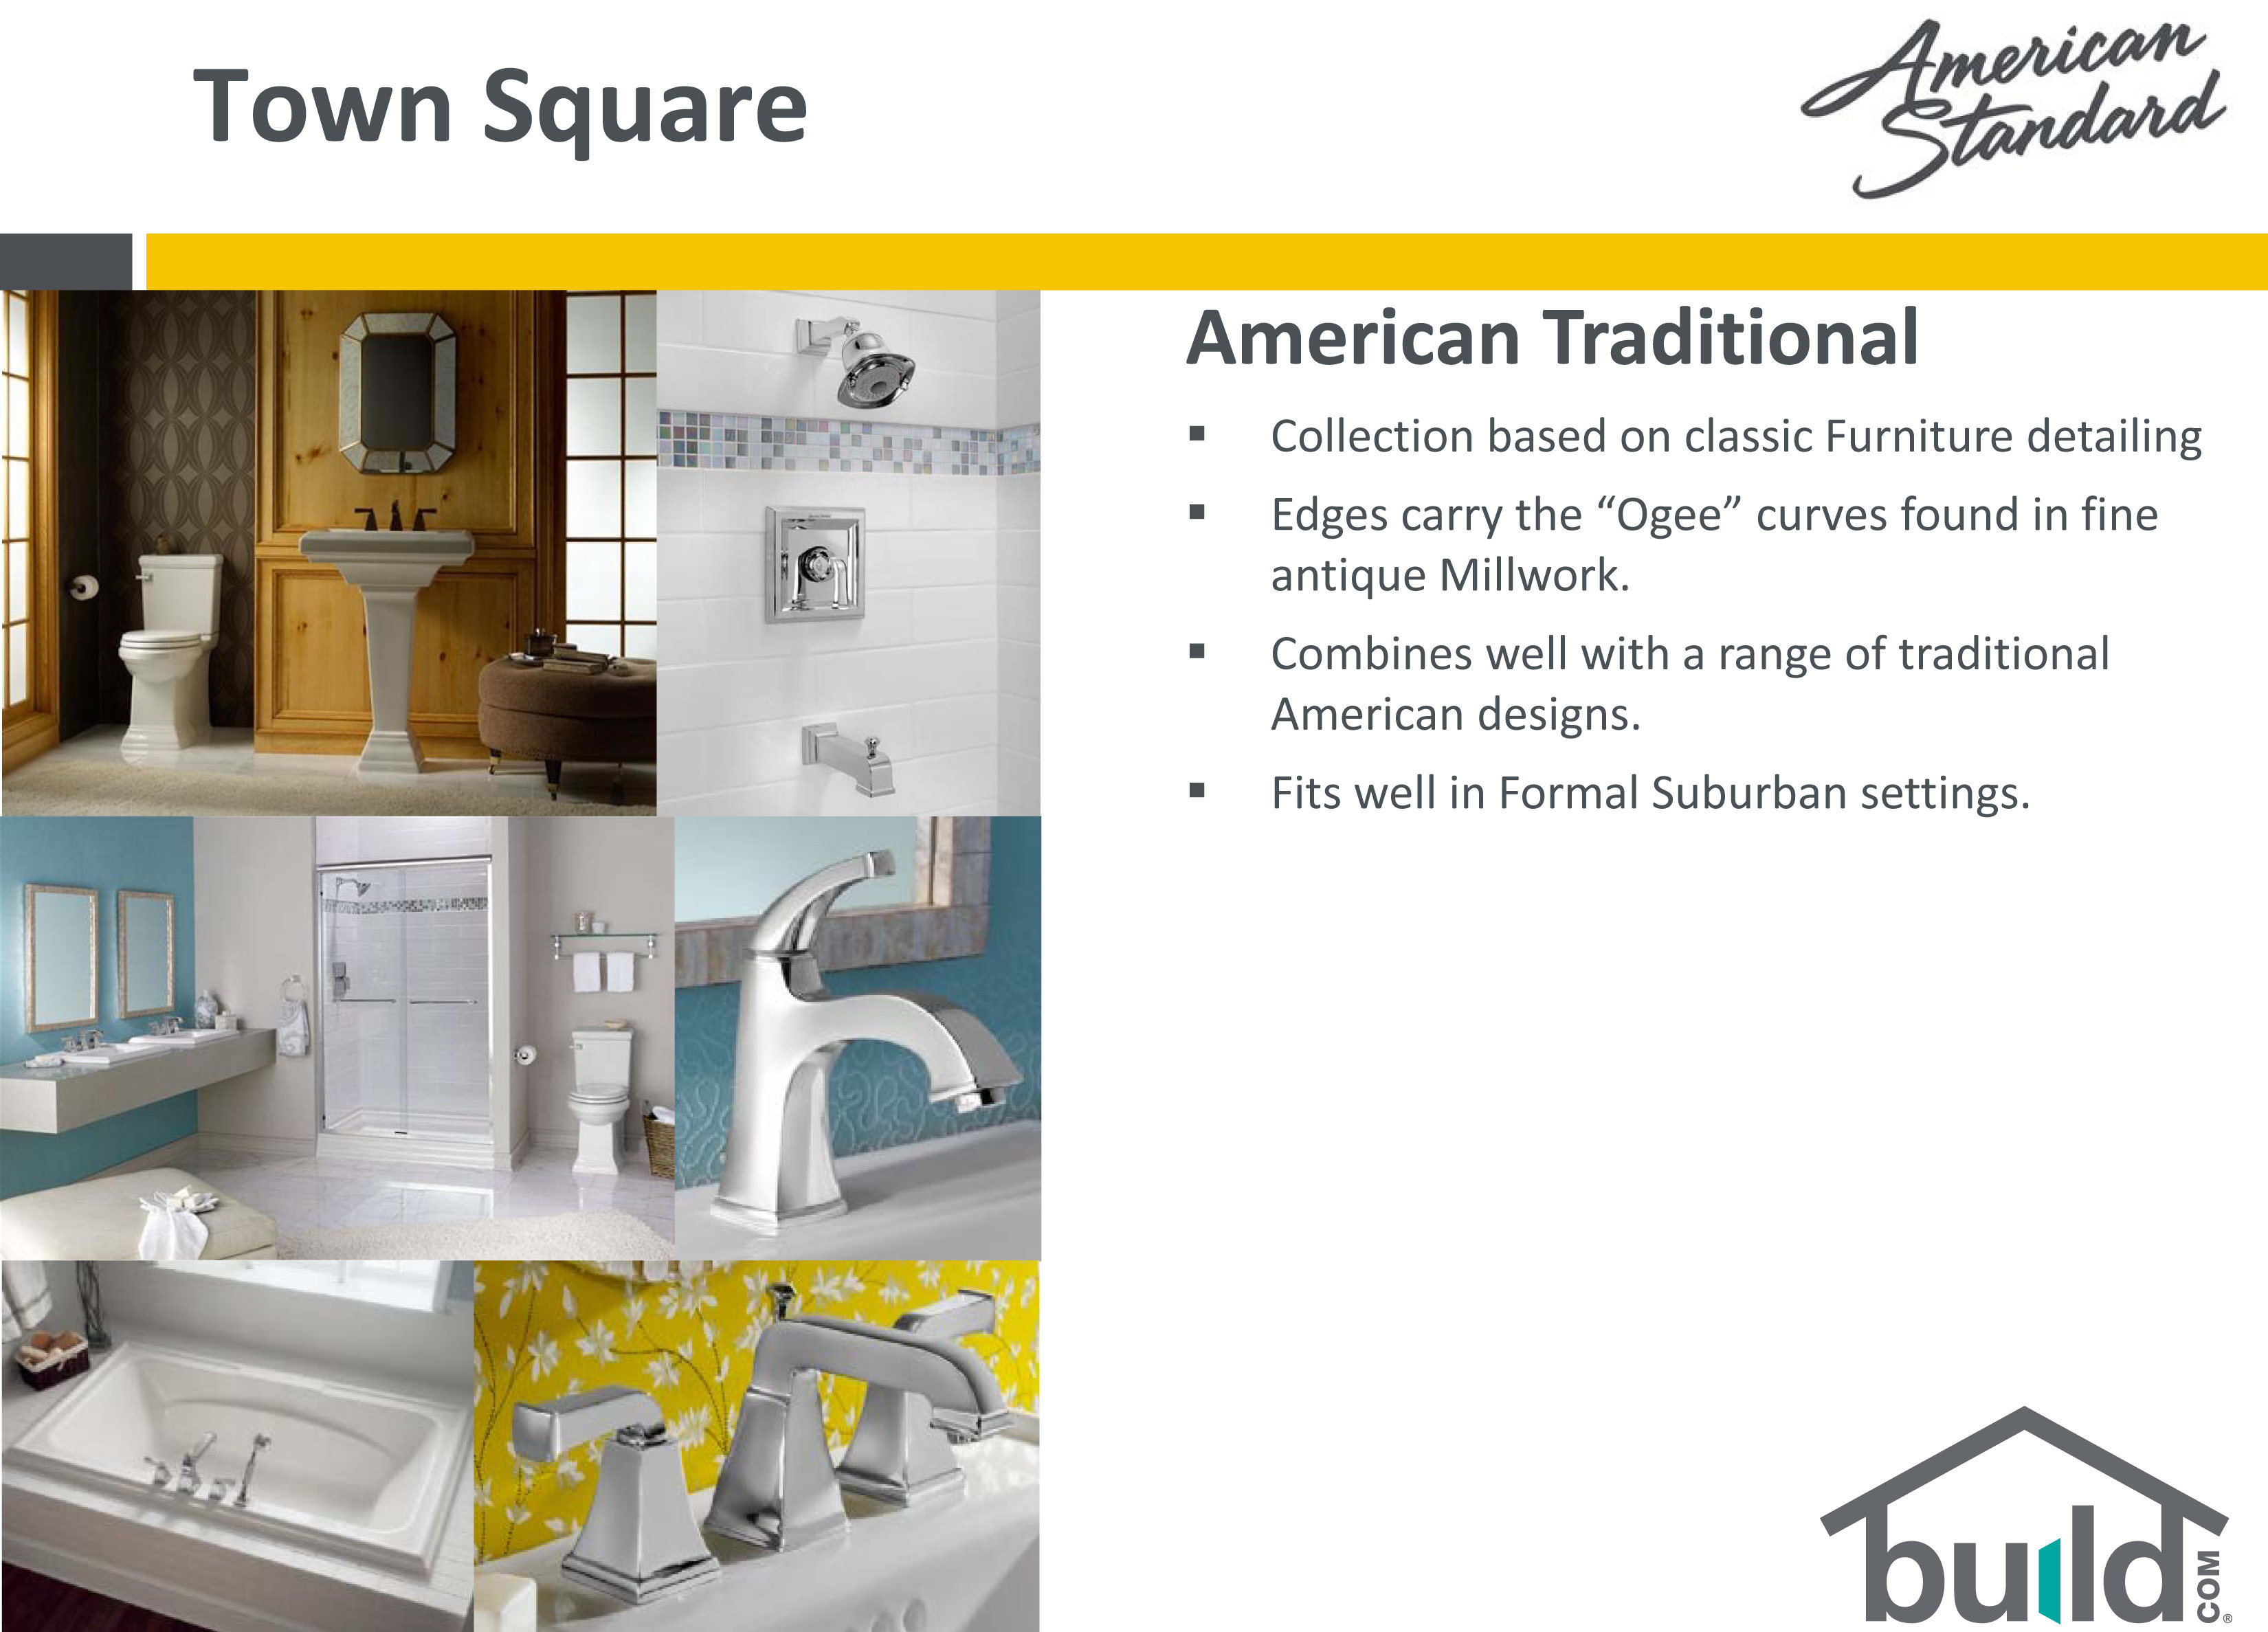 American Standard 0780.800.020 White Town Square Pedestal Bathroom ...